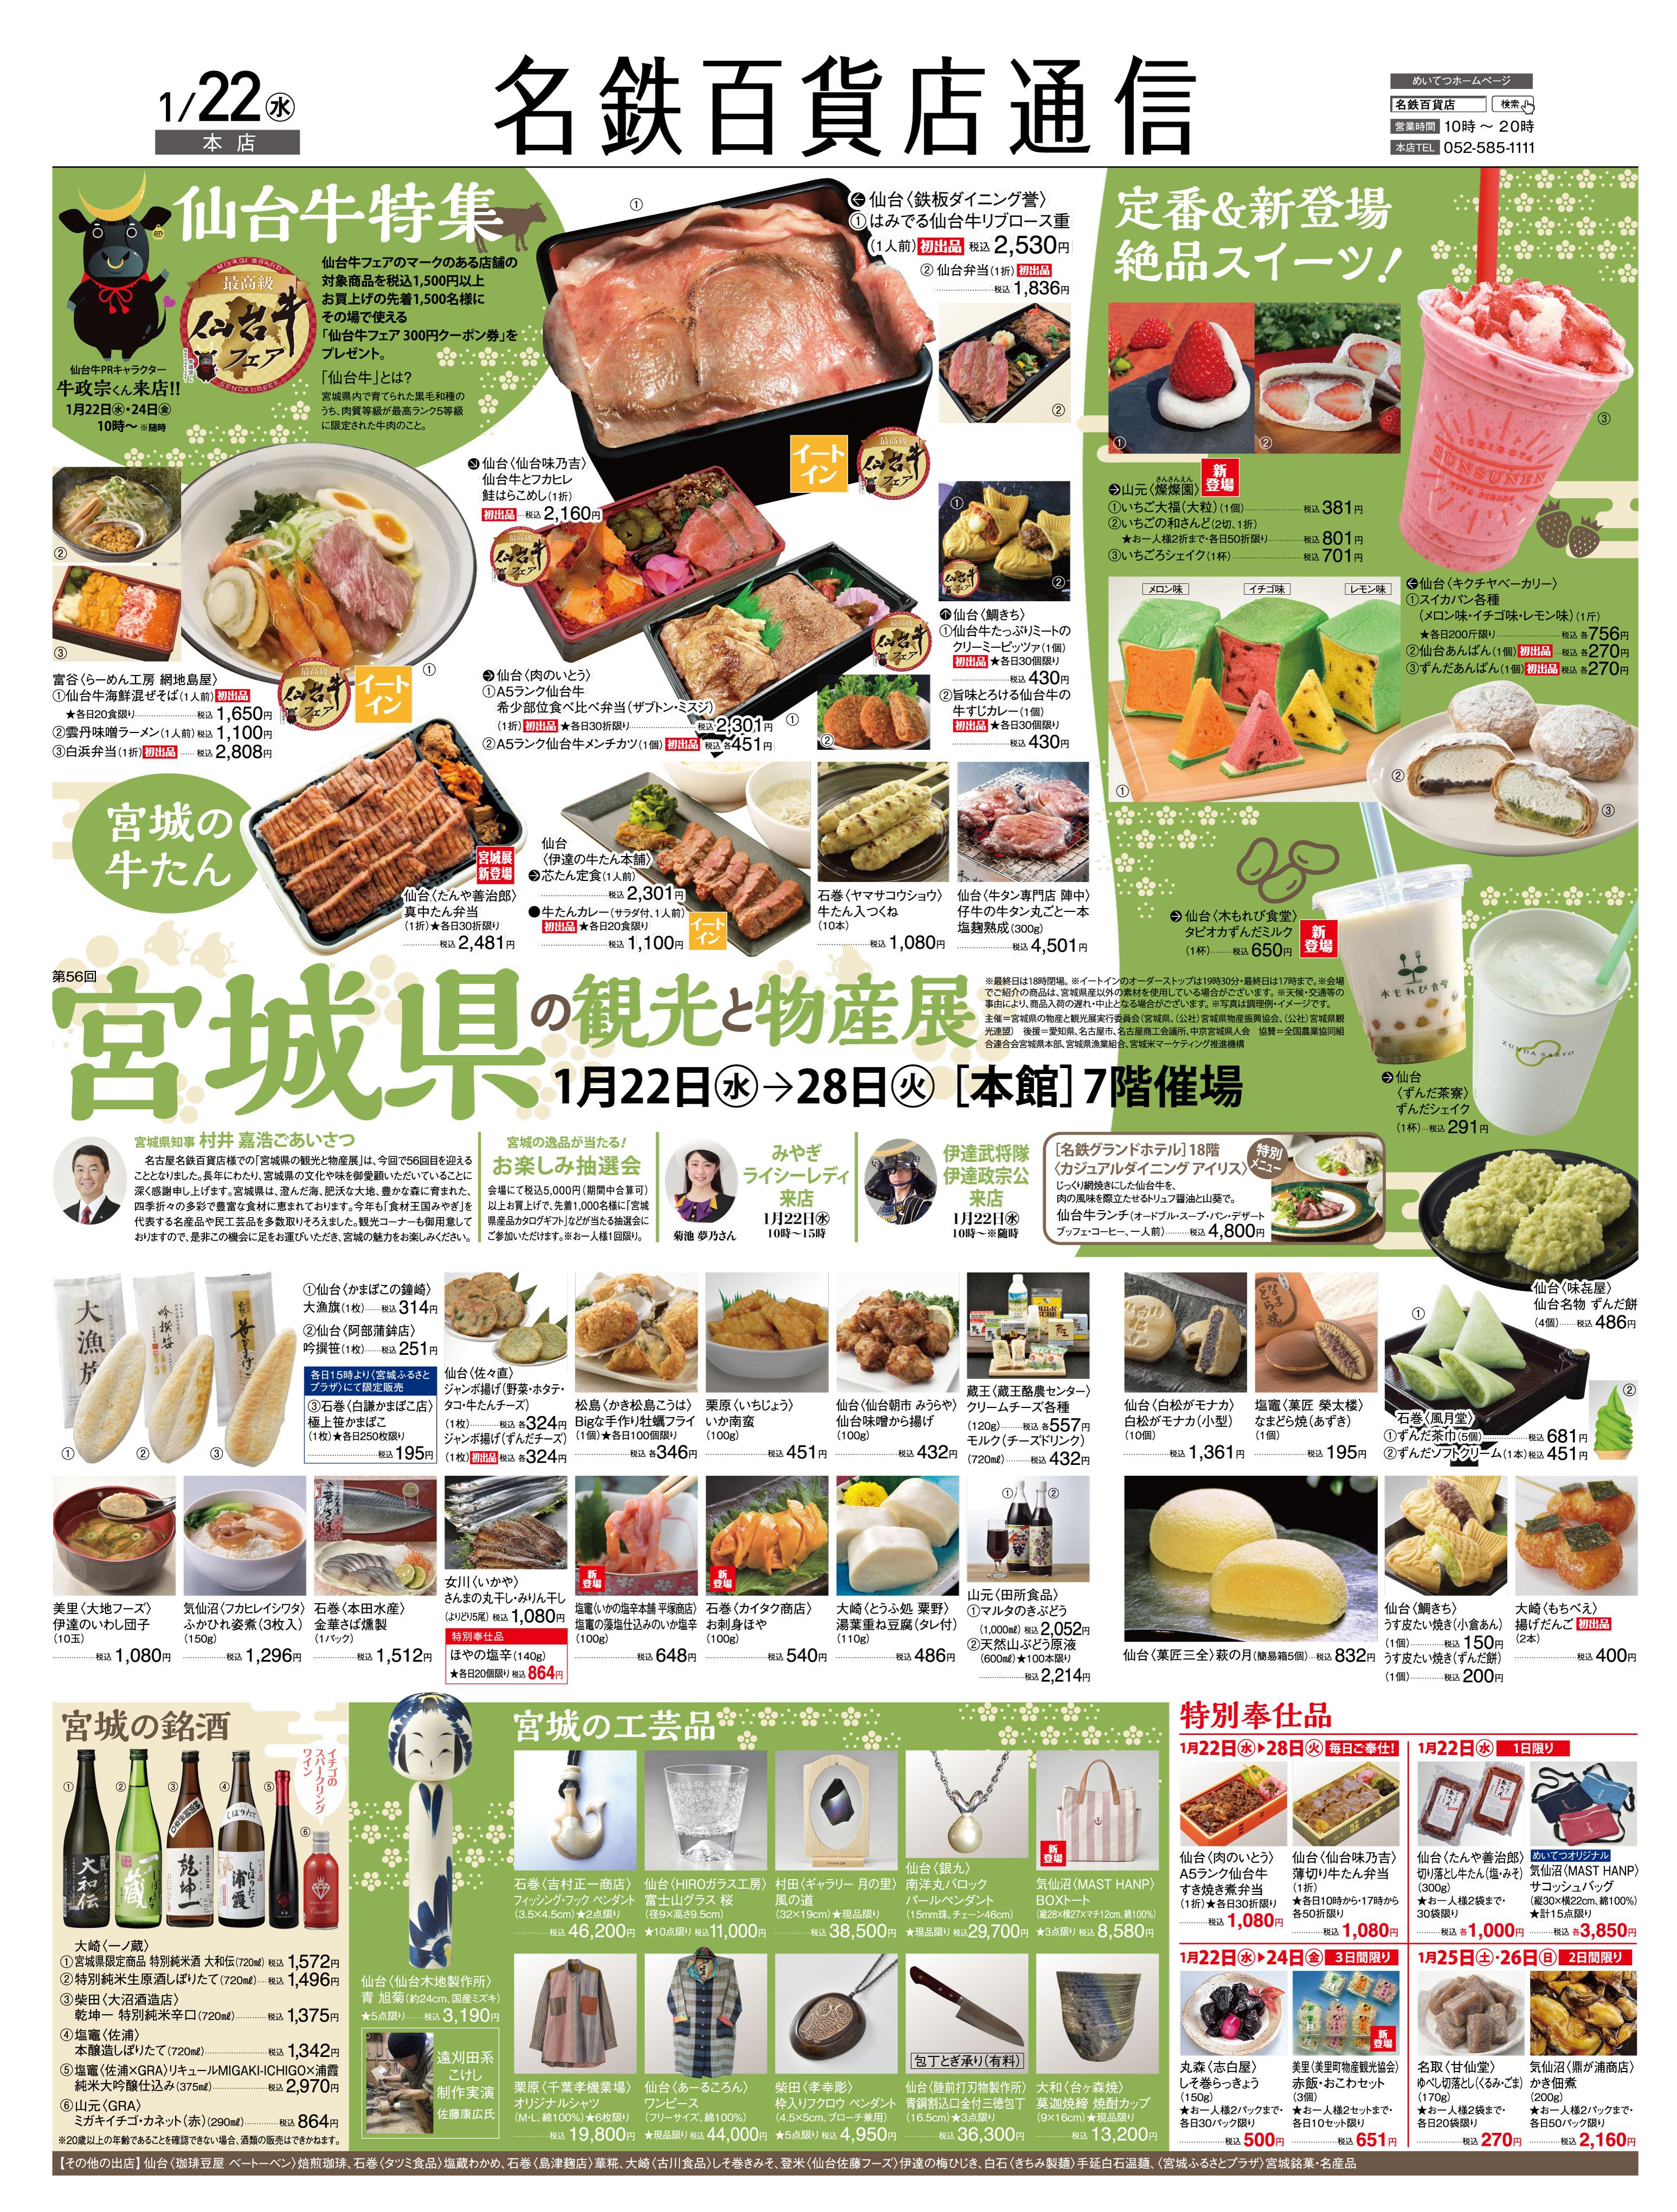 Meitetsu Department Store communication January 22 issue Miyagi prefecture's exhibition